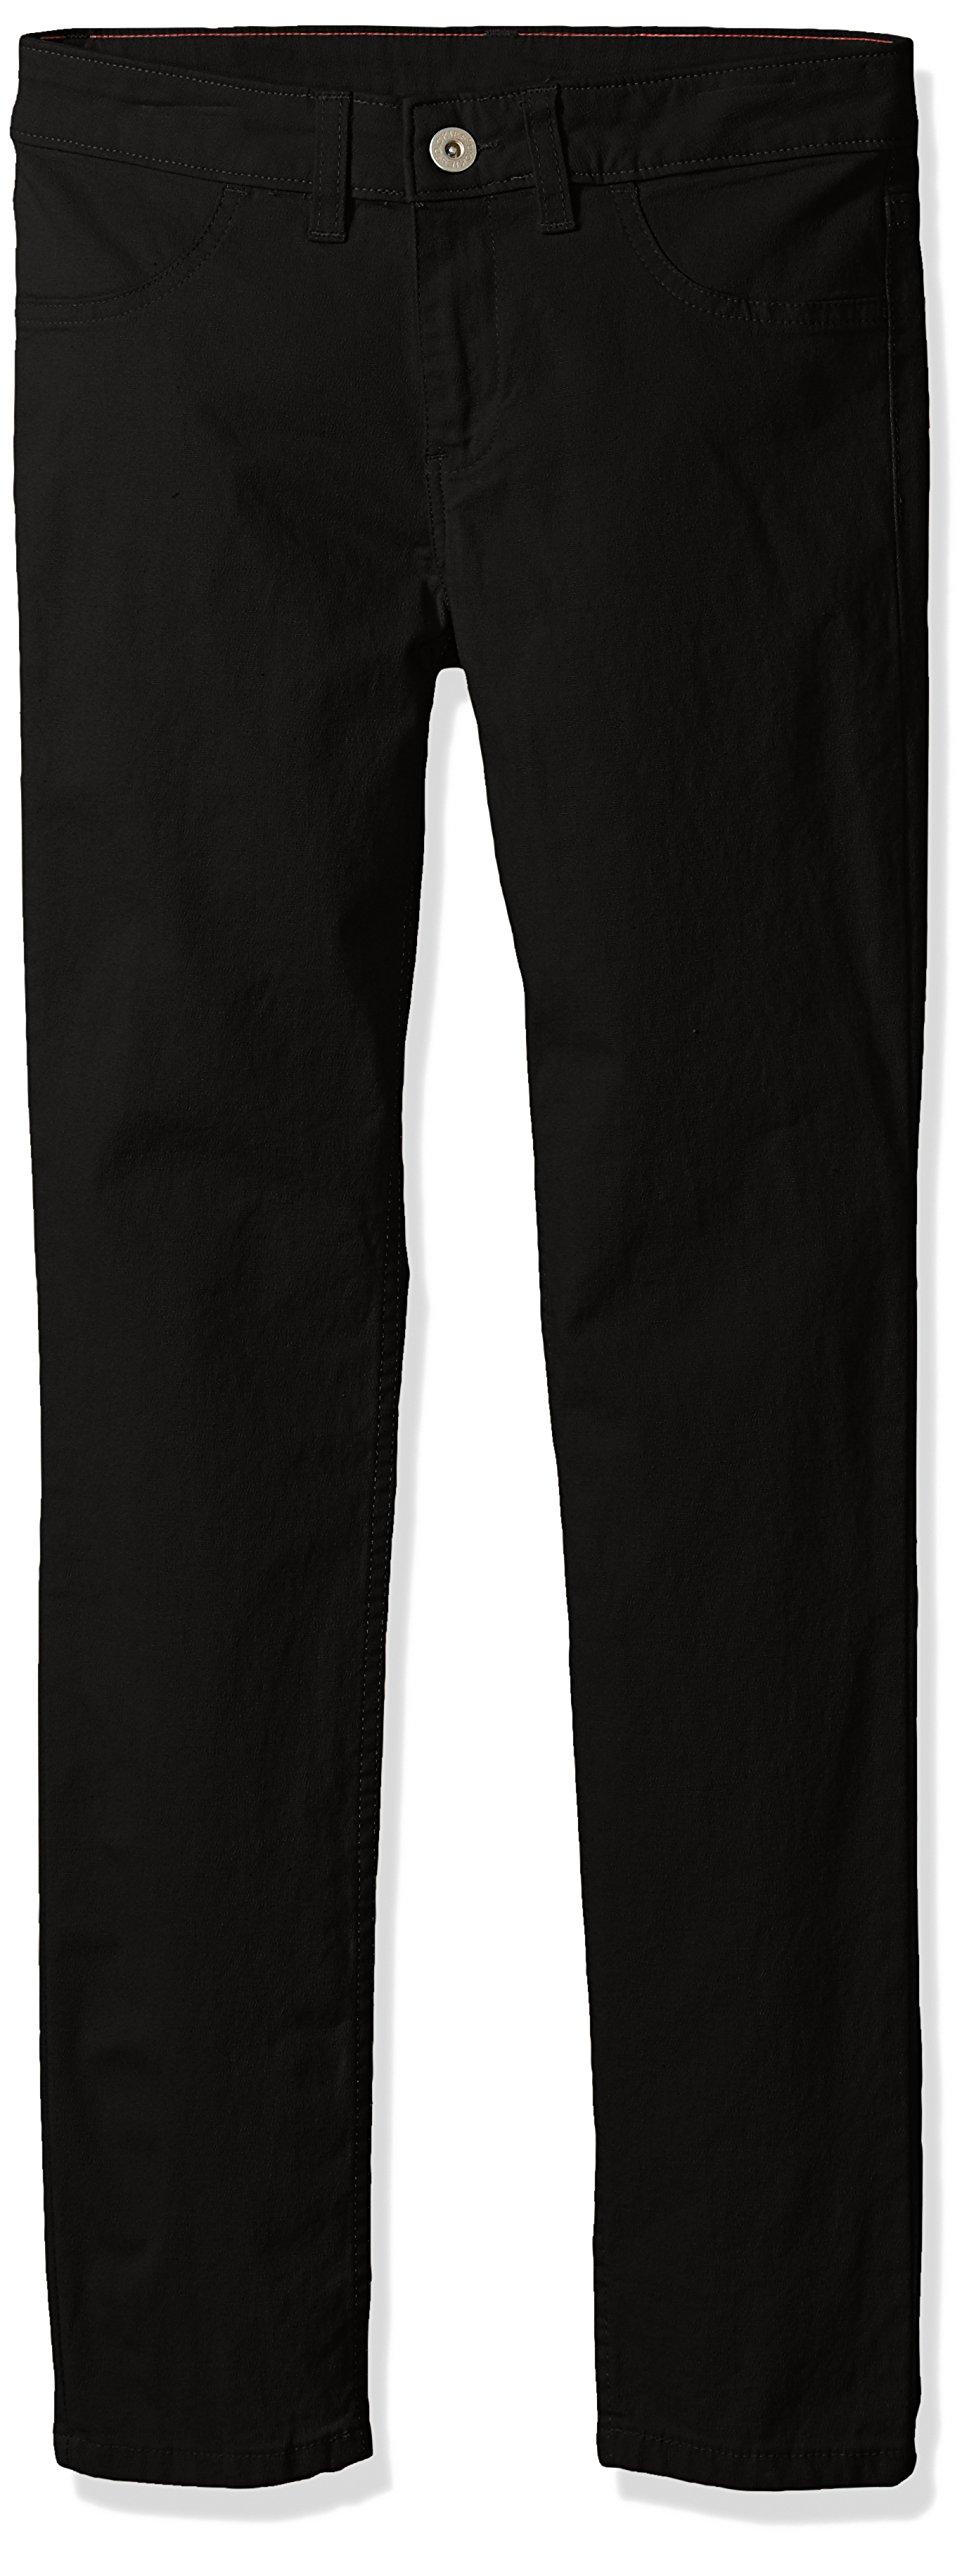 Dickies Big Girls' Super Skinny Stretch Pant, Rinsed Black, 14